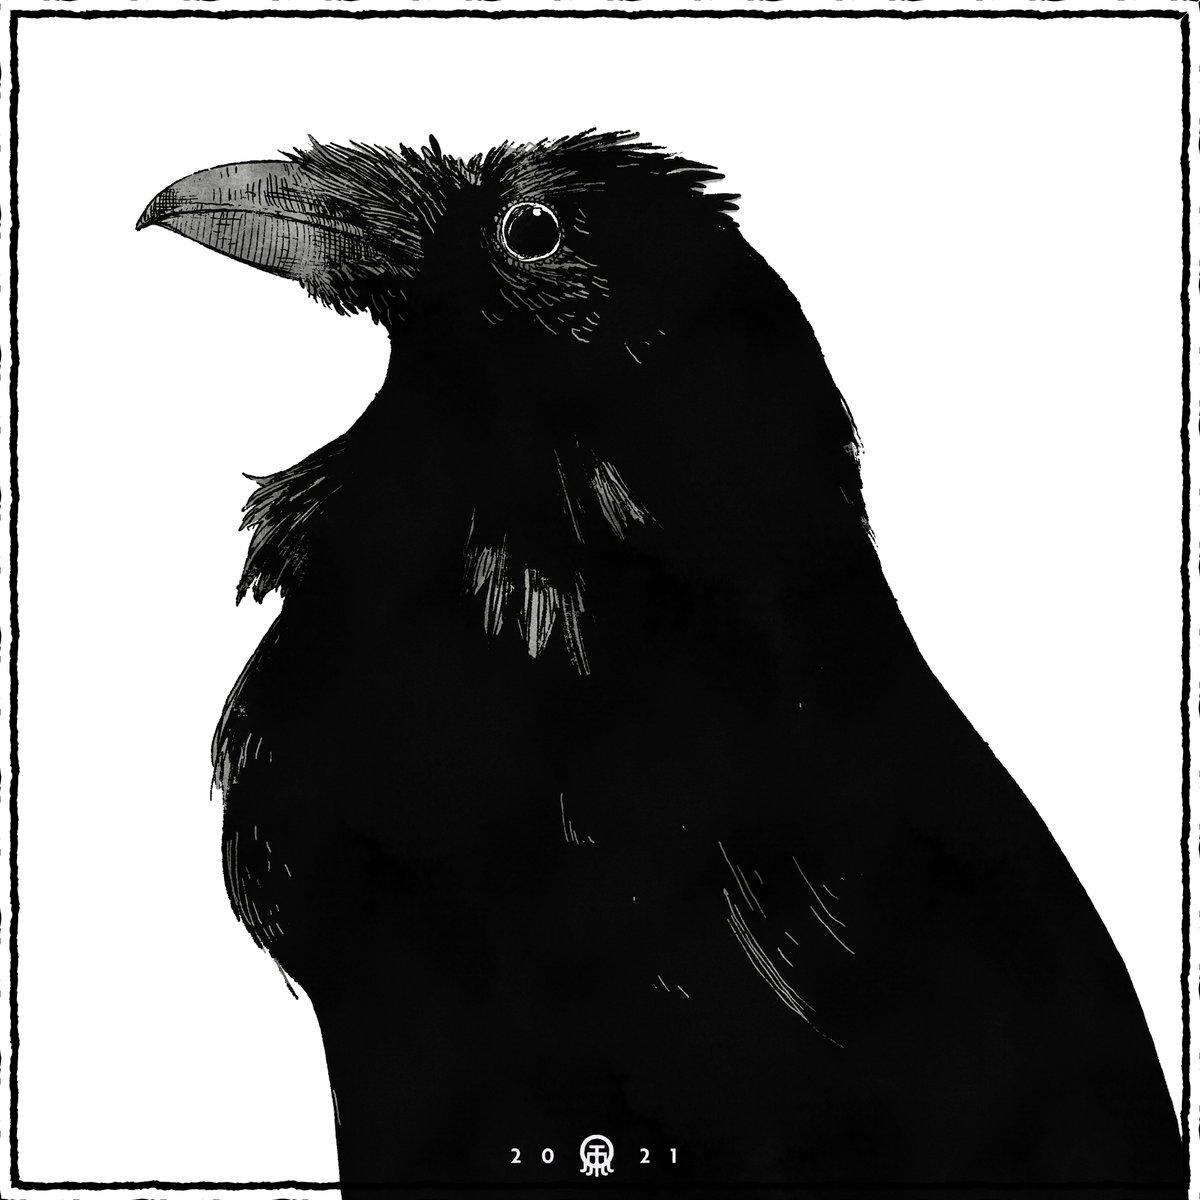 Edgar Allan Poe (/poʊ/; born Edgar Poe; January 19, 1809 – October 7, 1849) Φ Φ Φ Φ Φ #edgarallanpoe #poe #nevermore #crow #crows #raven #sketch #doodle #darkart #darkartists #darkartwork #lowbrowart #lowbrowartist #horrorart #horrorartwork https://t.co/NLIGQStQkc